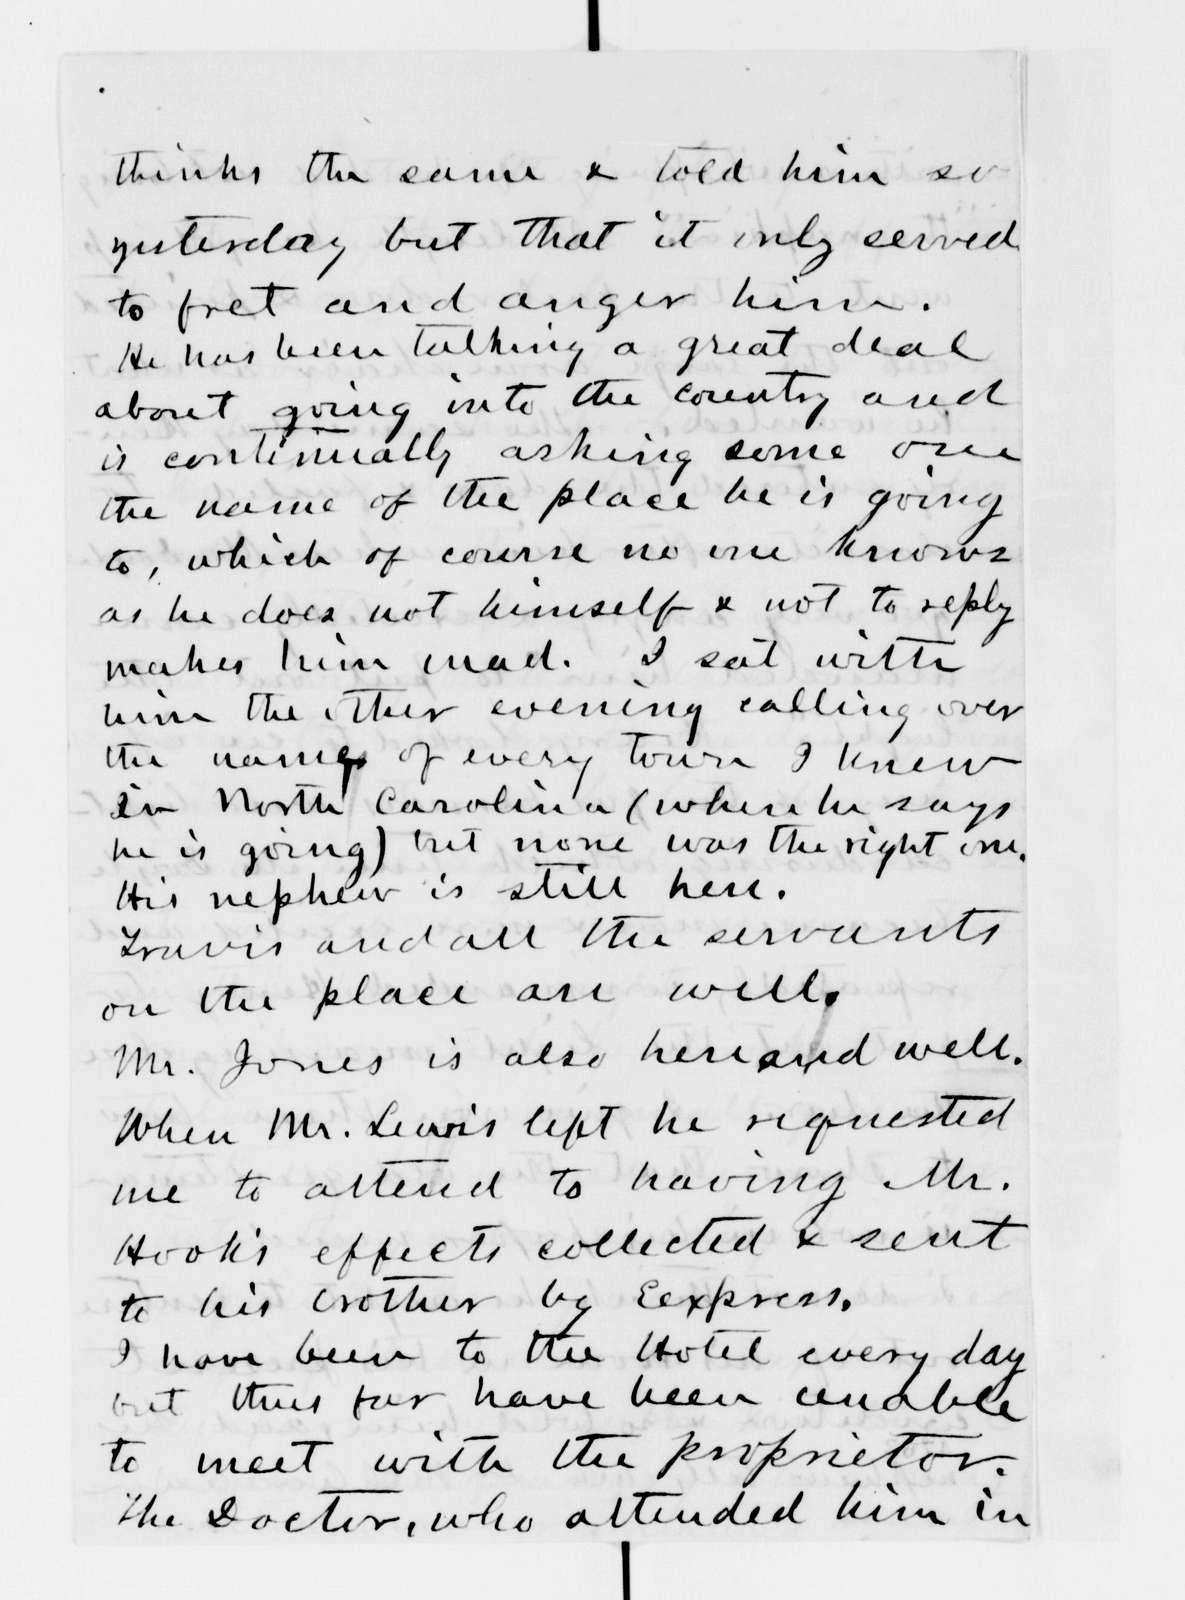 Alexander Hamilton Stephens Papers: General Correspondence, 1784-1886; 1862, Mar. 29-Apr. 29